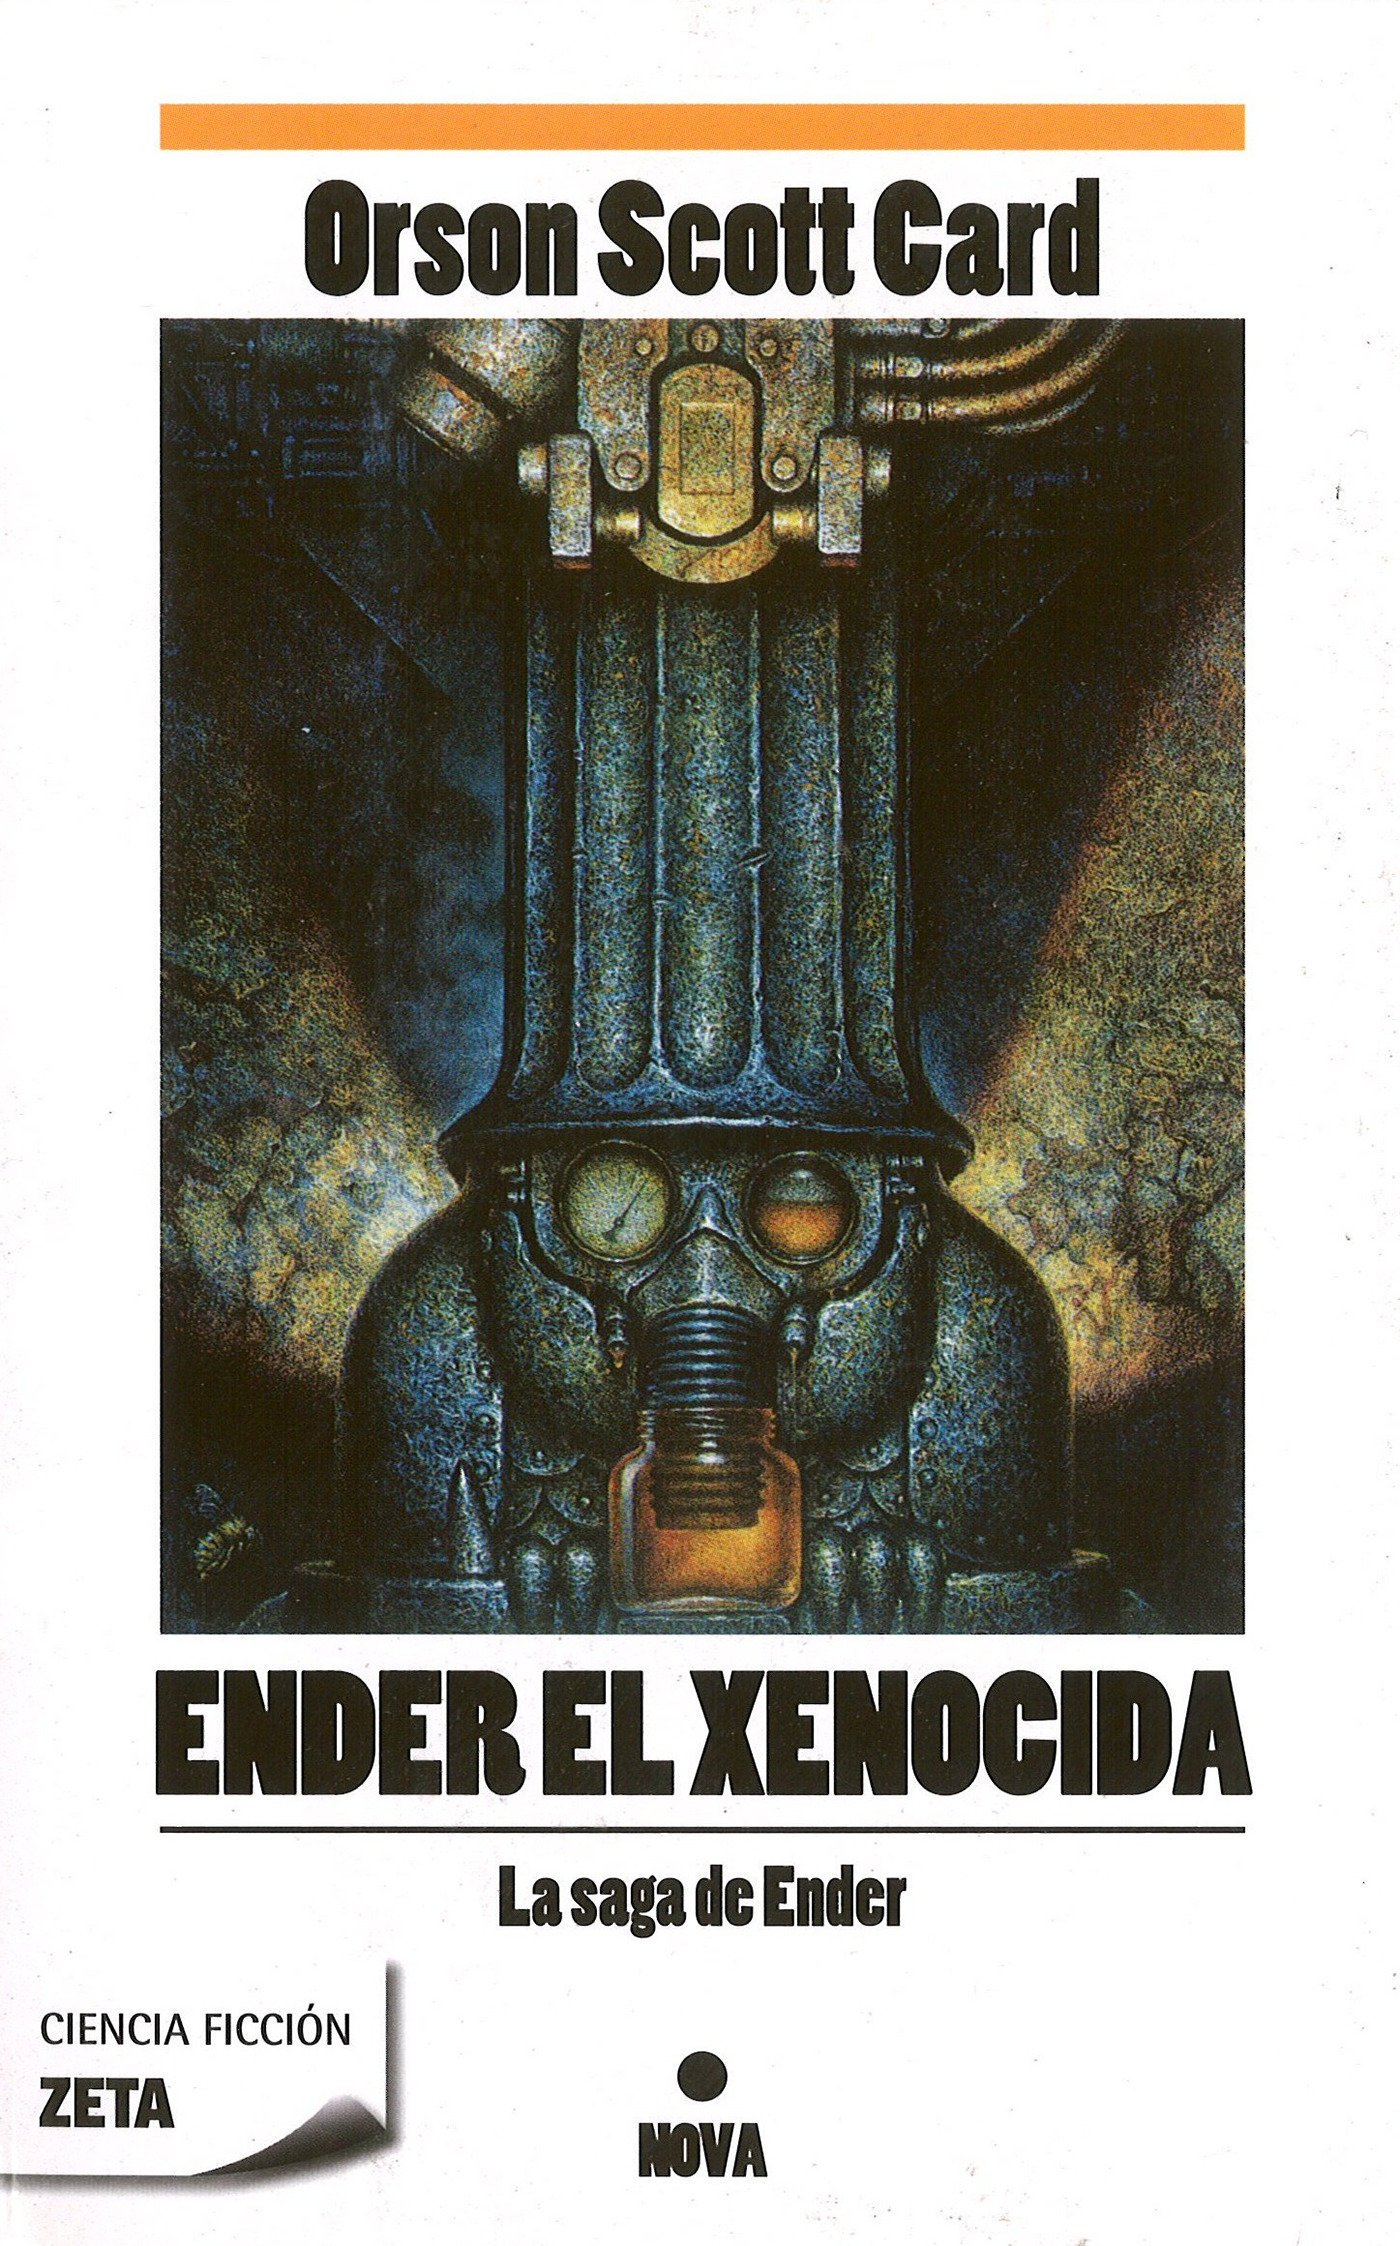 Ender el xenocida (Saga de Ender 3) (B DE BOLSILLO) Tapa blanda – 18 nov 2009 Orson Scott Card B de Bolsillo (Ediciones B) 8498723116 Fiction / General